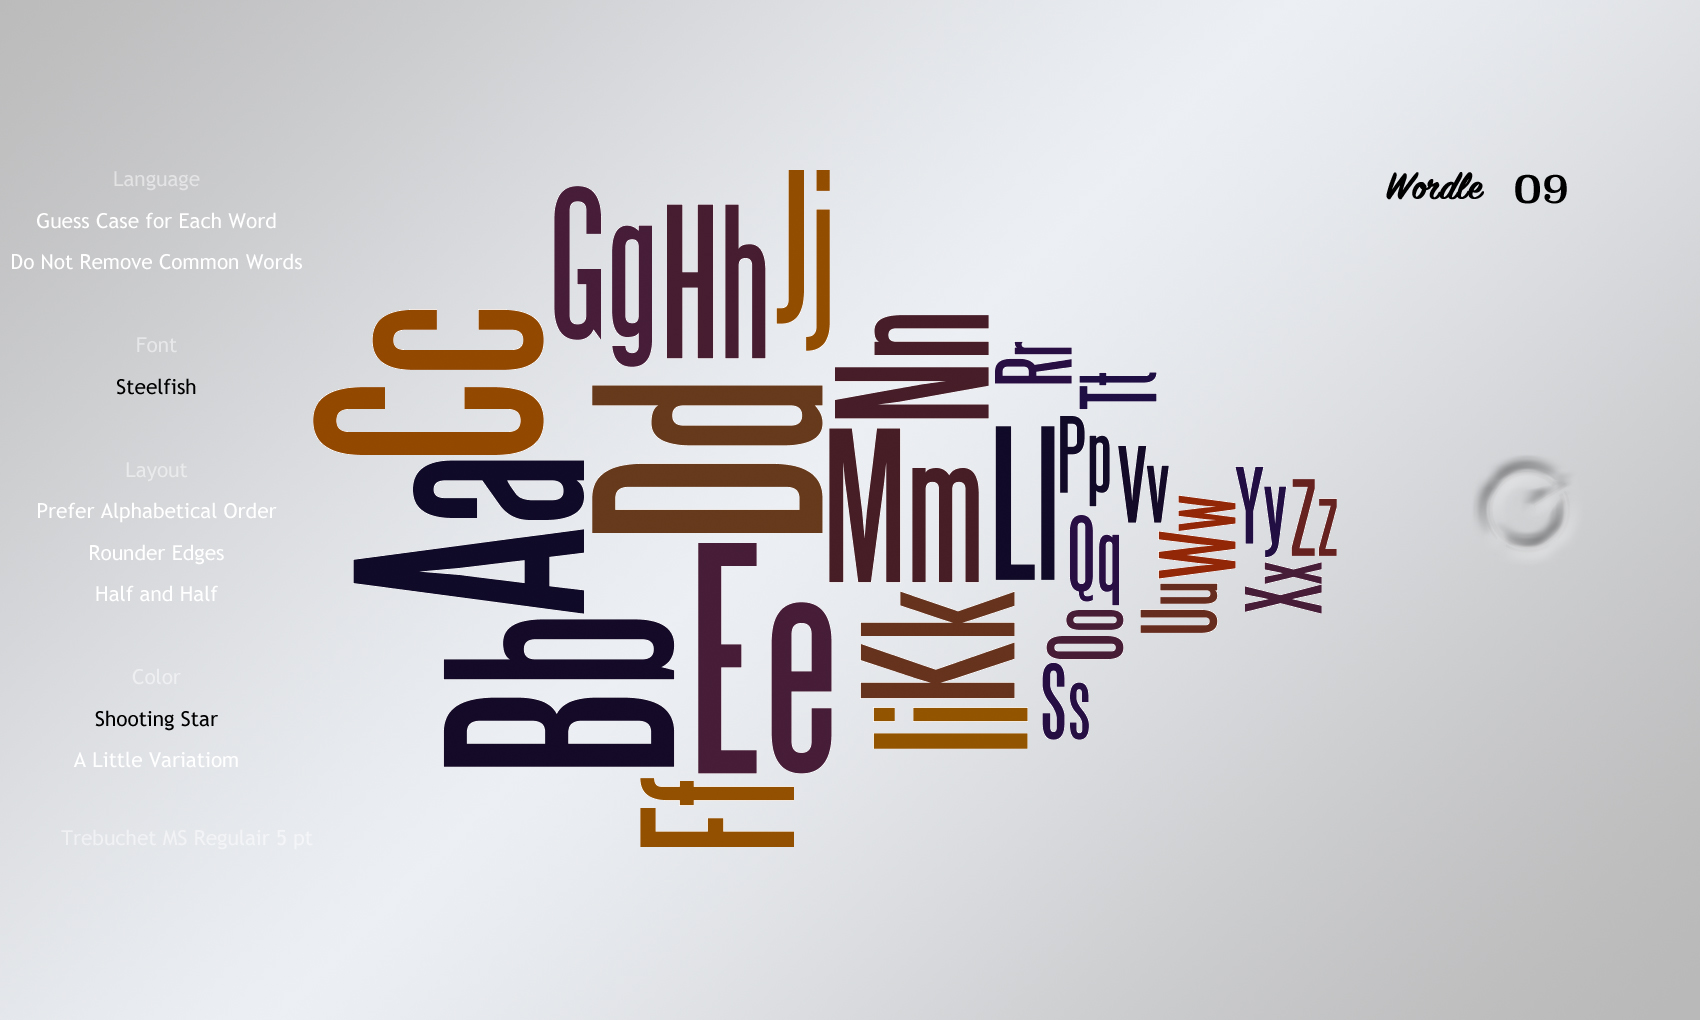 Wordle09 Steelfish